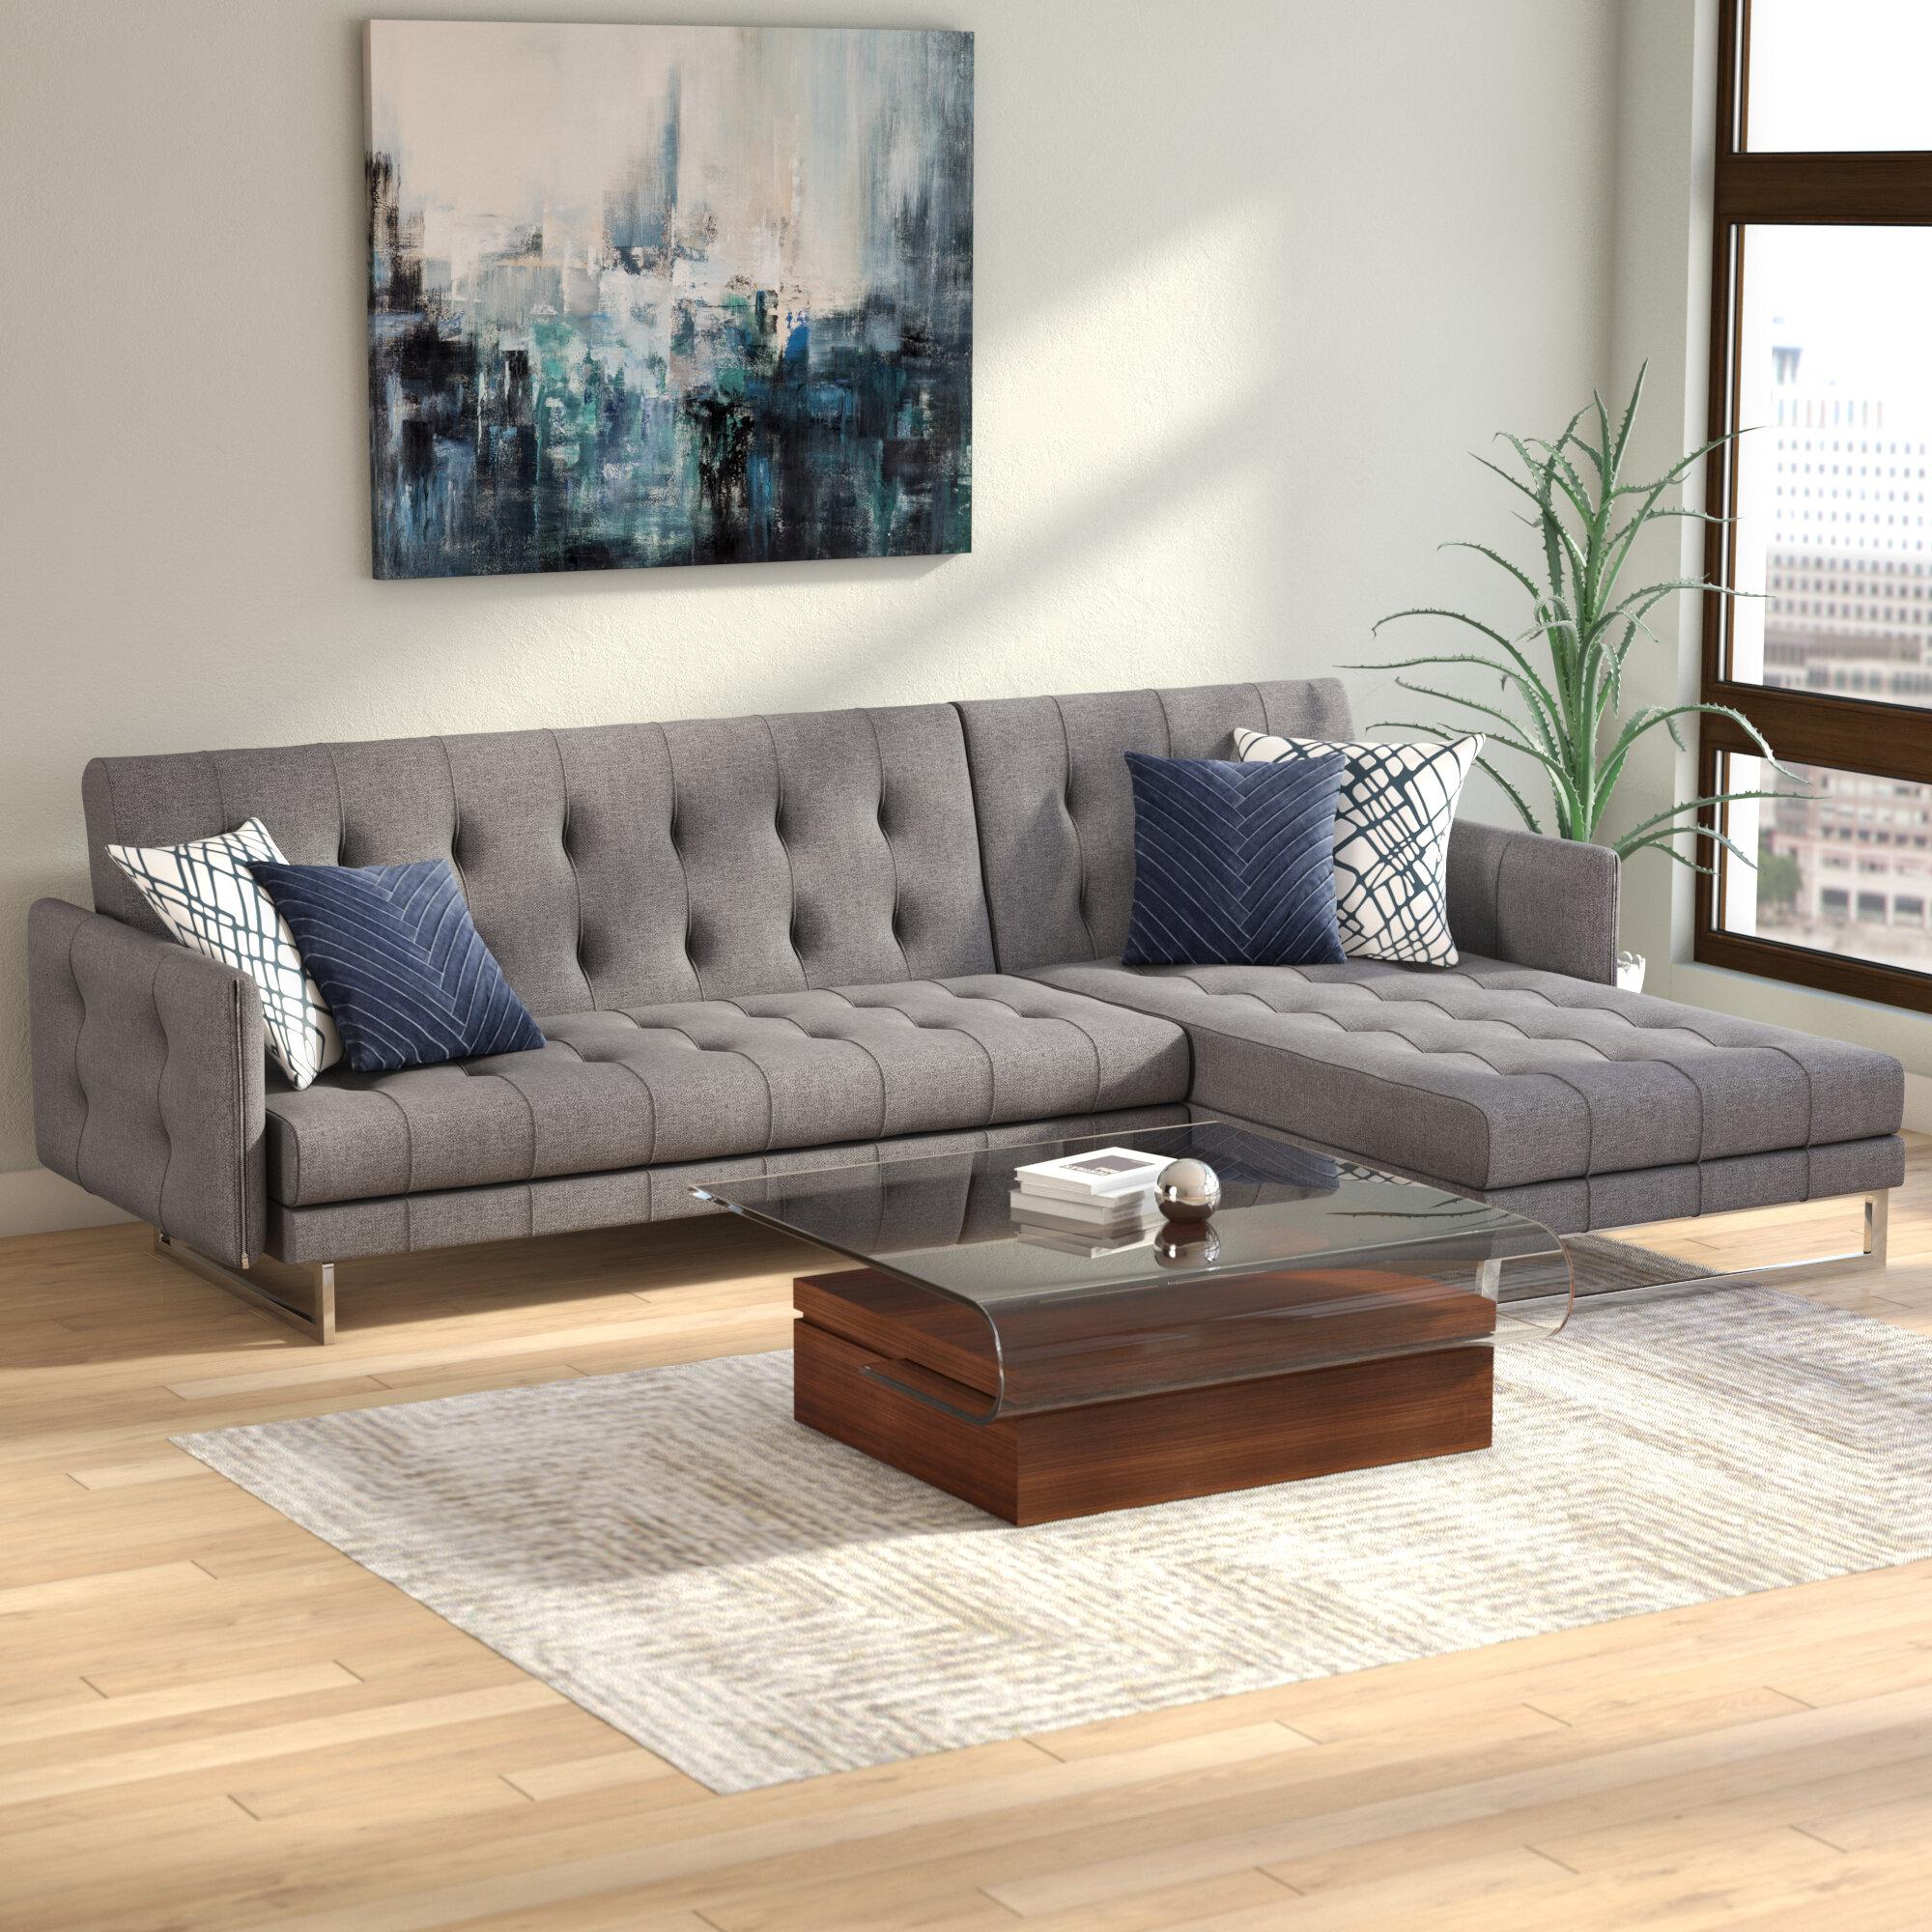 mcznobw sectional macys memory benefits bed sleeper beautiful foam sofa blogbeen of